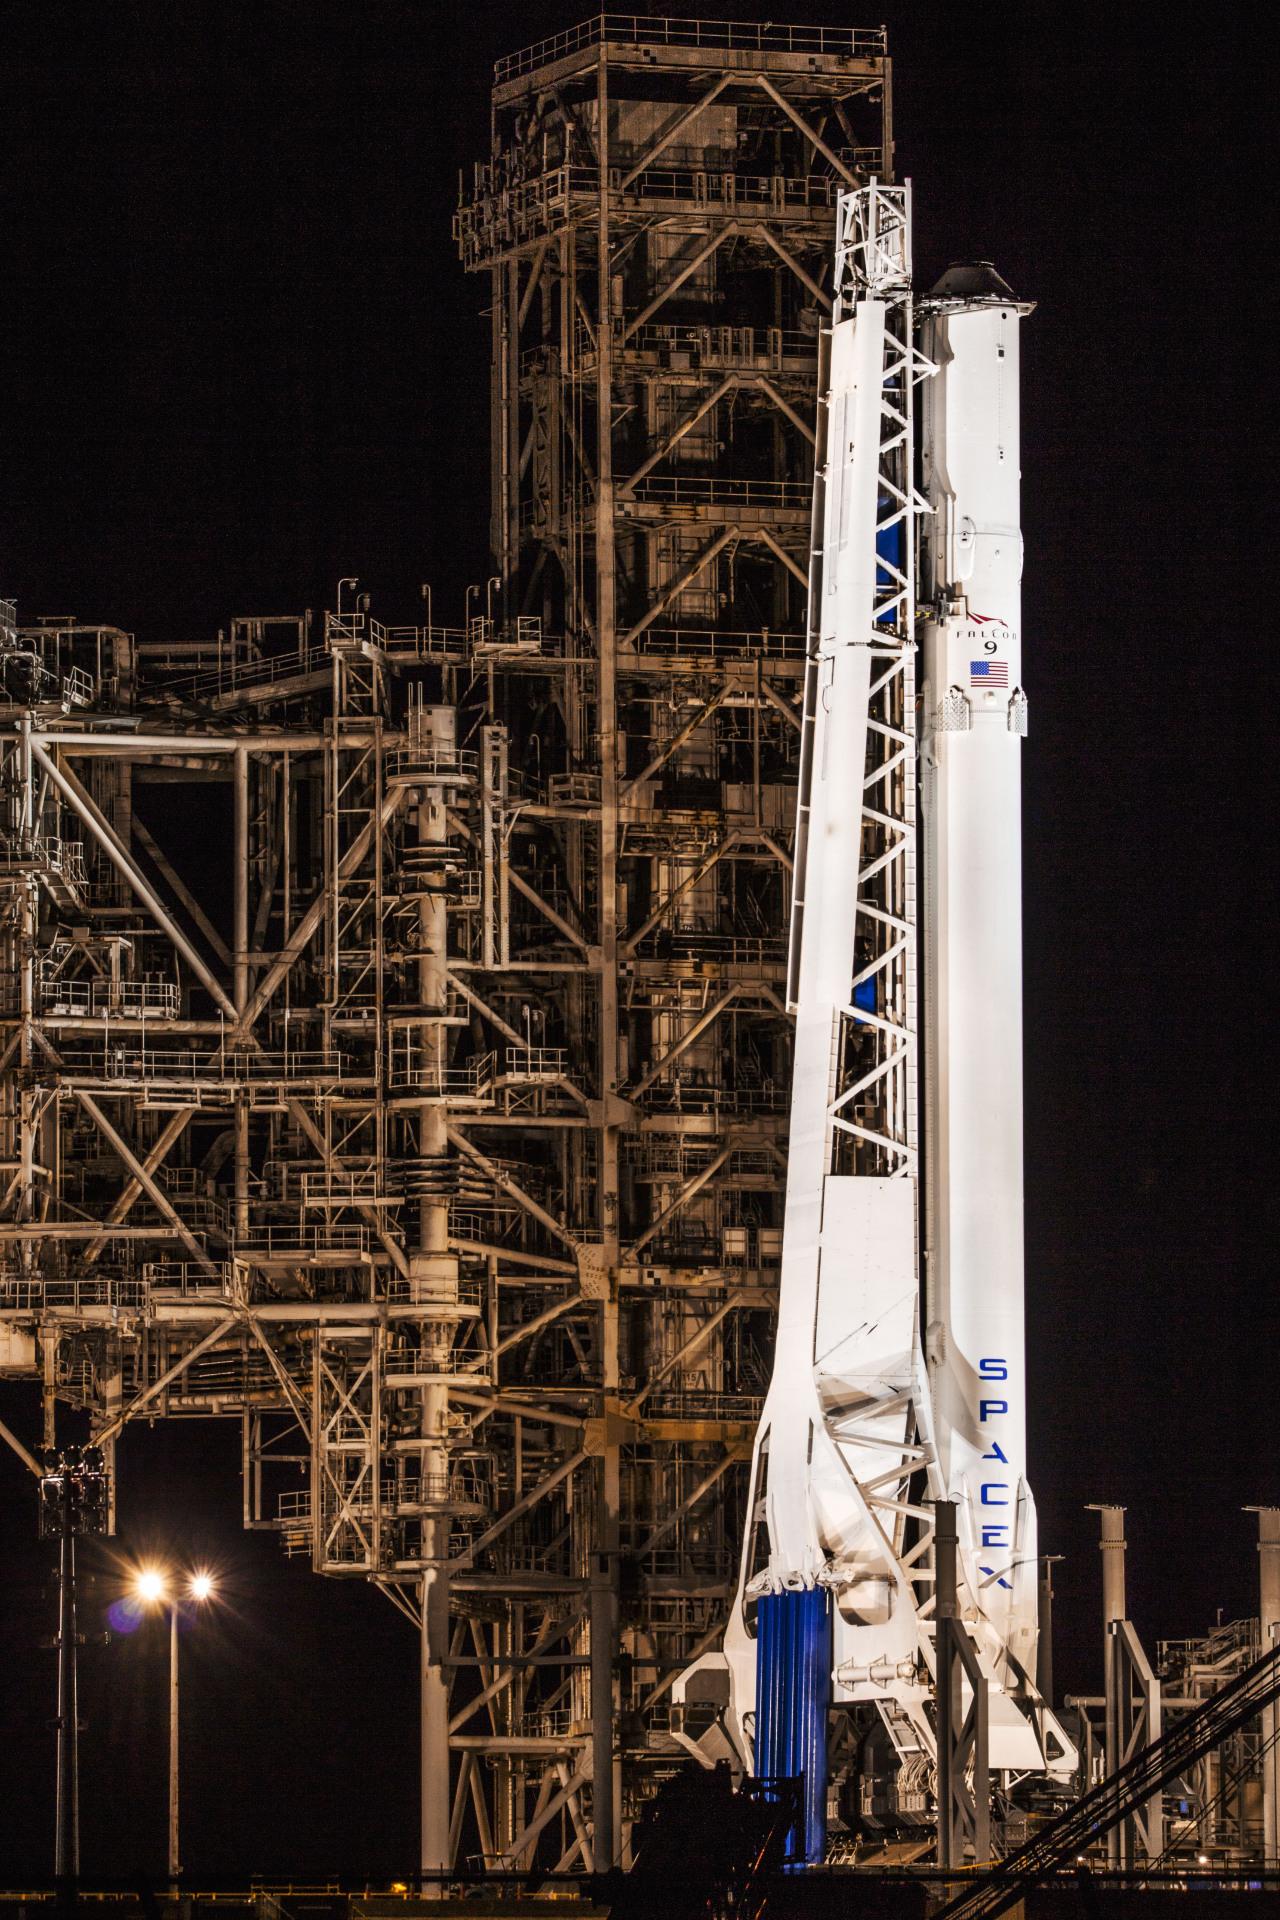 Falcon-9 (CRS-10) - 19.02.17  [Succès] - Page 4 Tumblr_ol6ztq3RMq1ttka3go10_1280